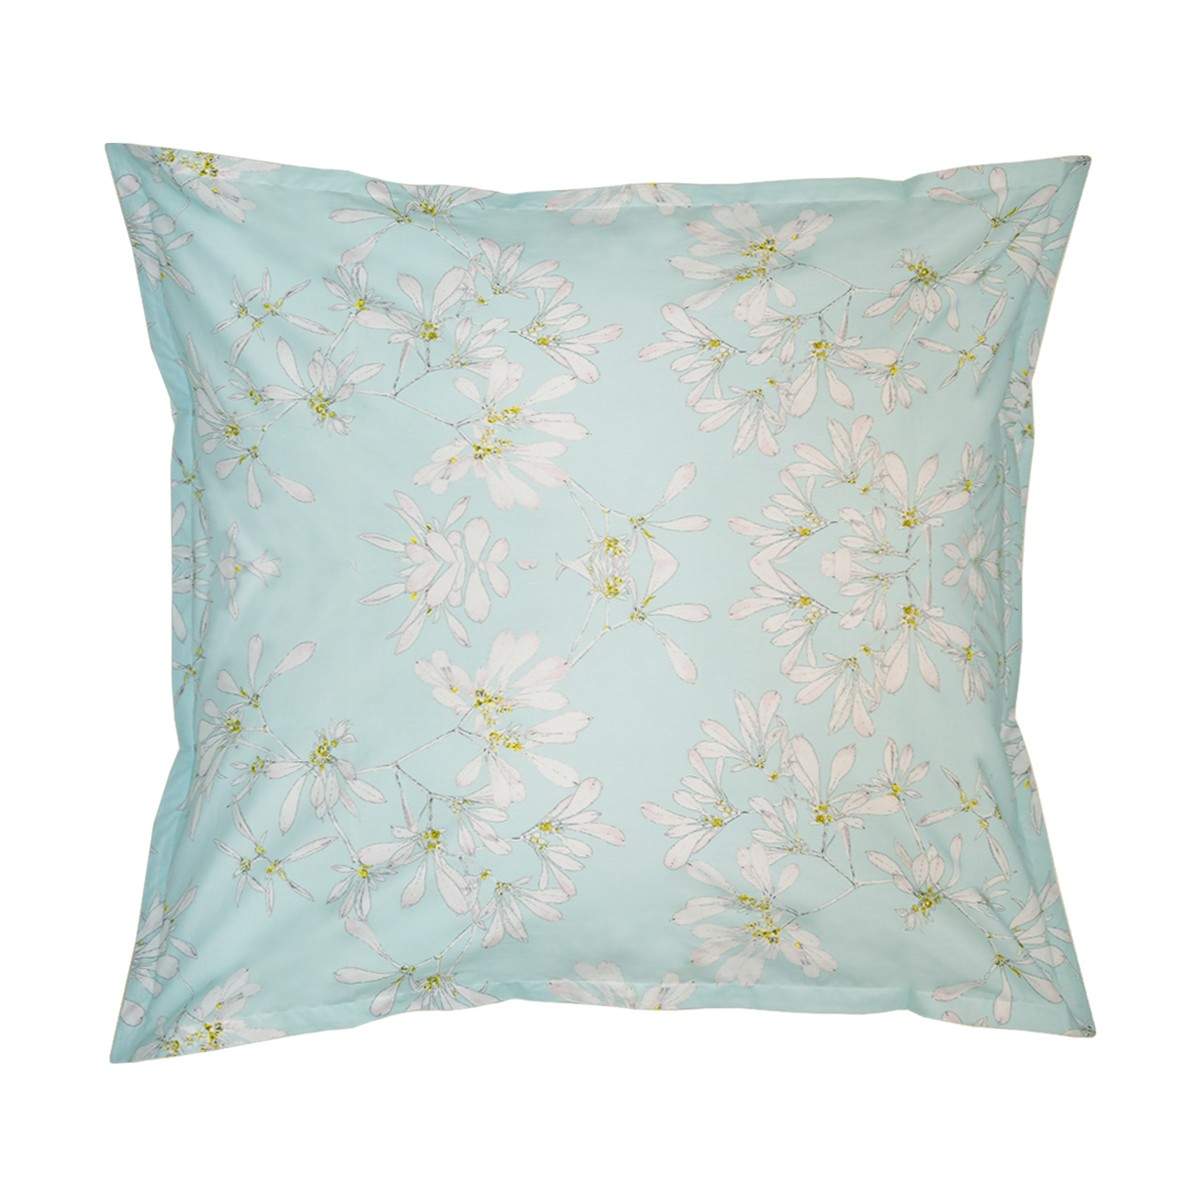 Decorative Pillowcase, Bucolic